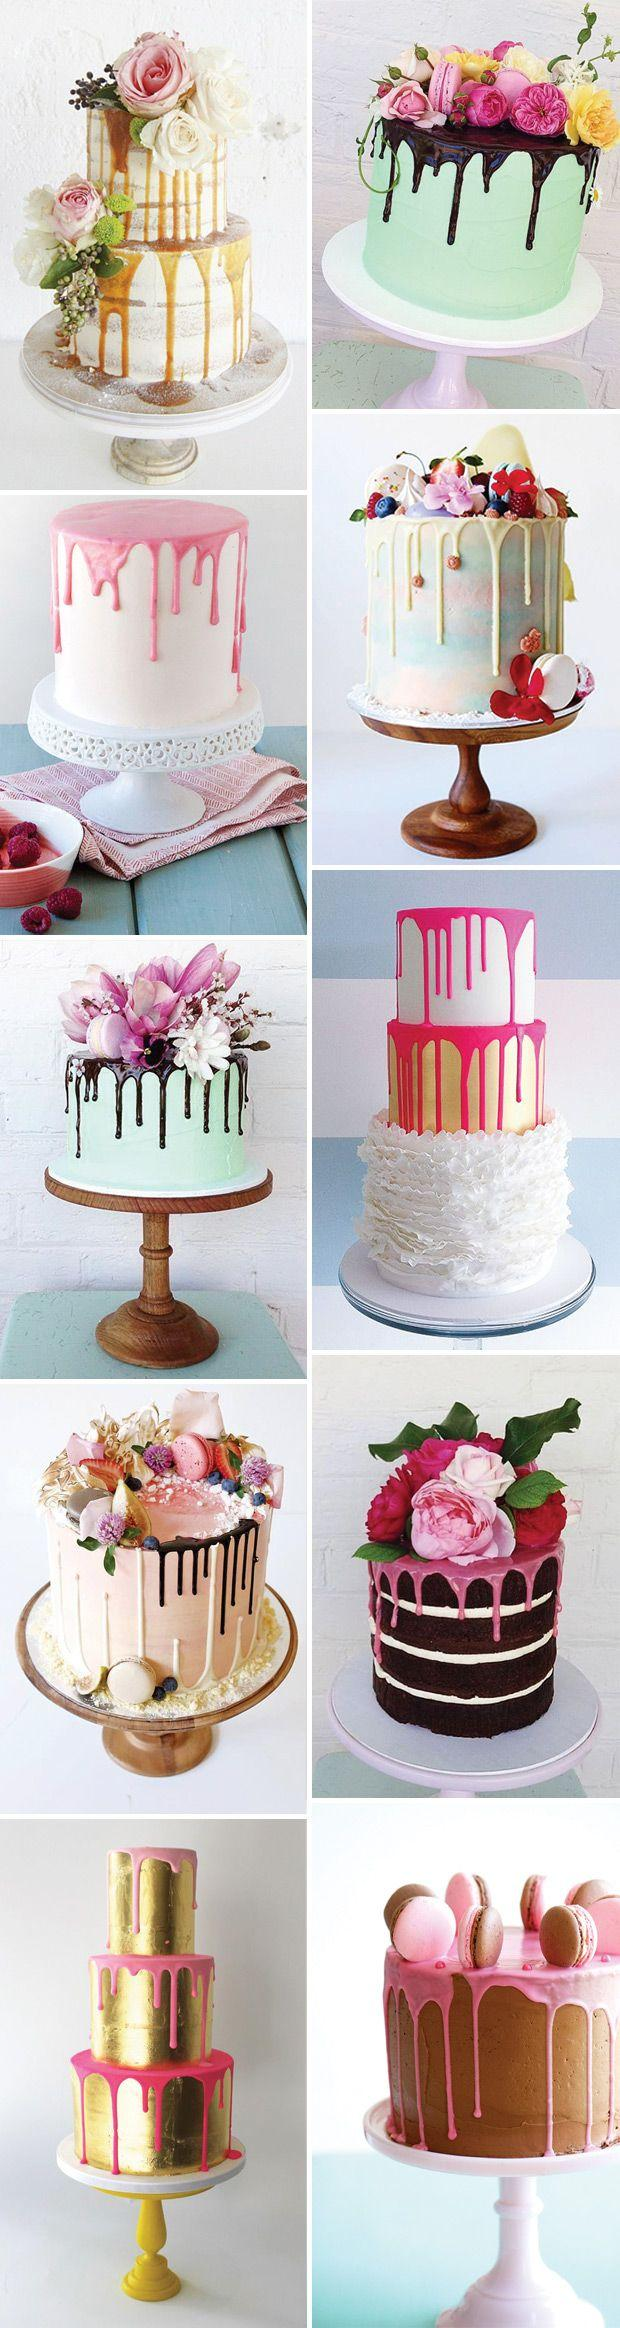 Hochzeit - The Hottest Cake Trend: Delish & Fun Colour Drip Cakes